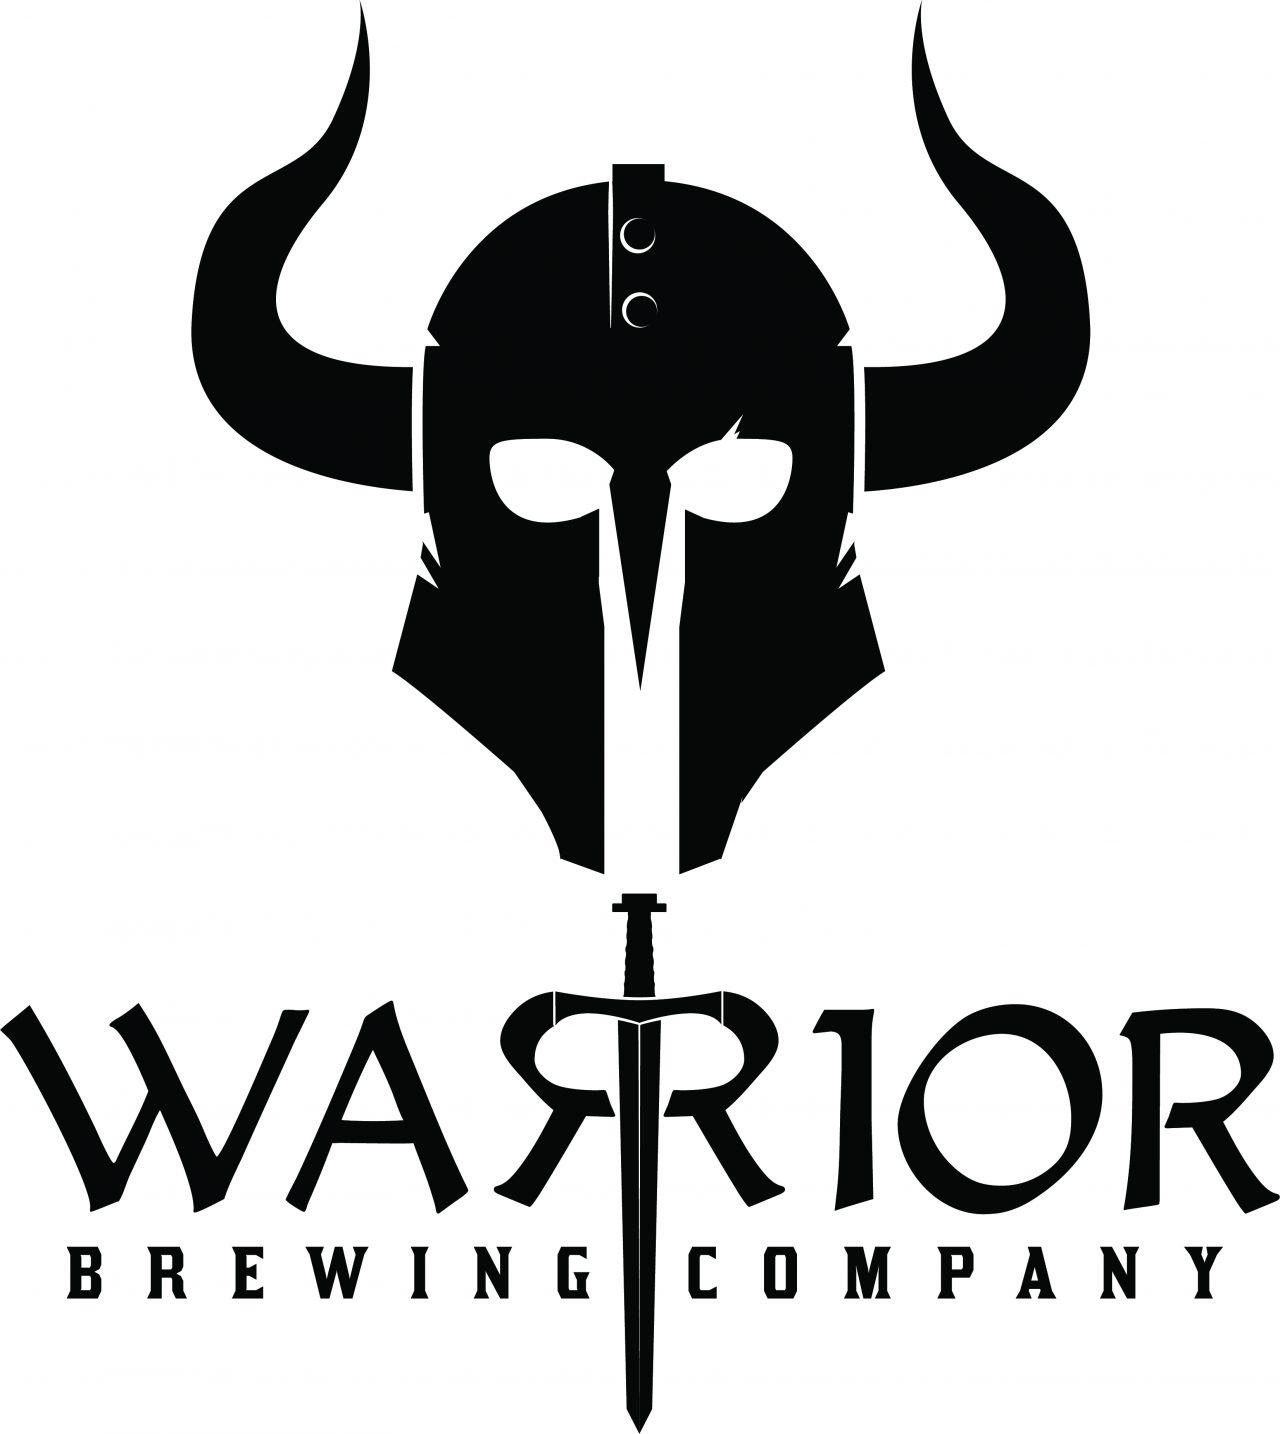 https://www.mncraftbrew.org/wp-content/uploads/2021/06/warrior-brewing_final-1280x1434.jpg